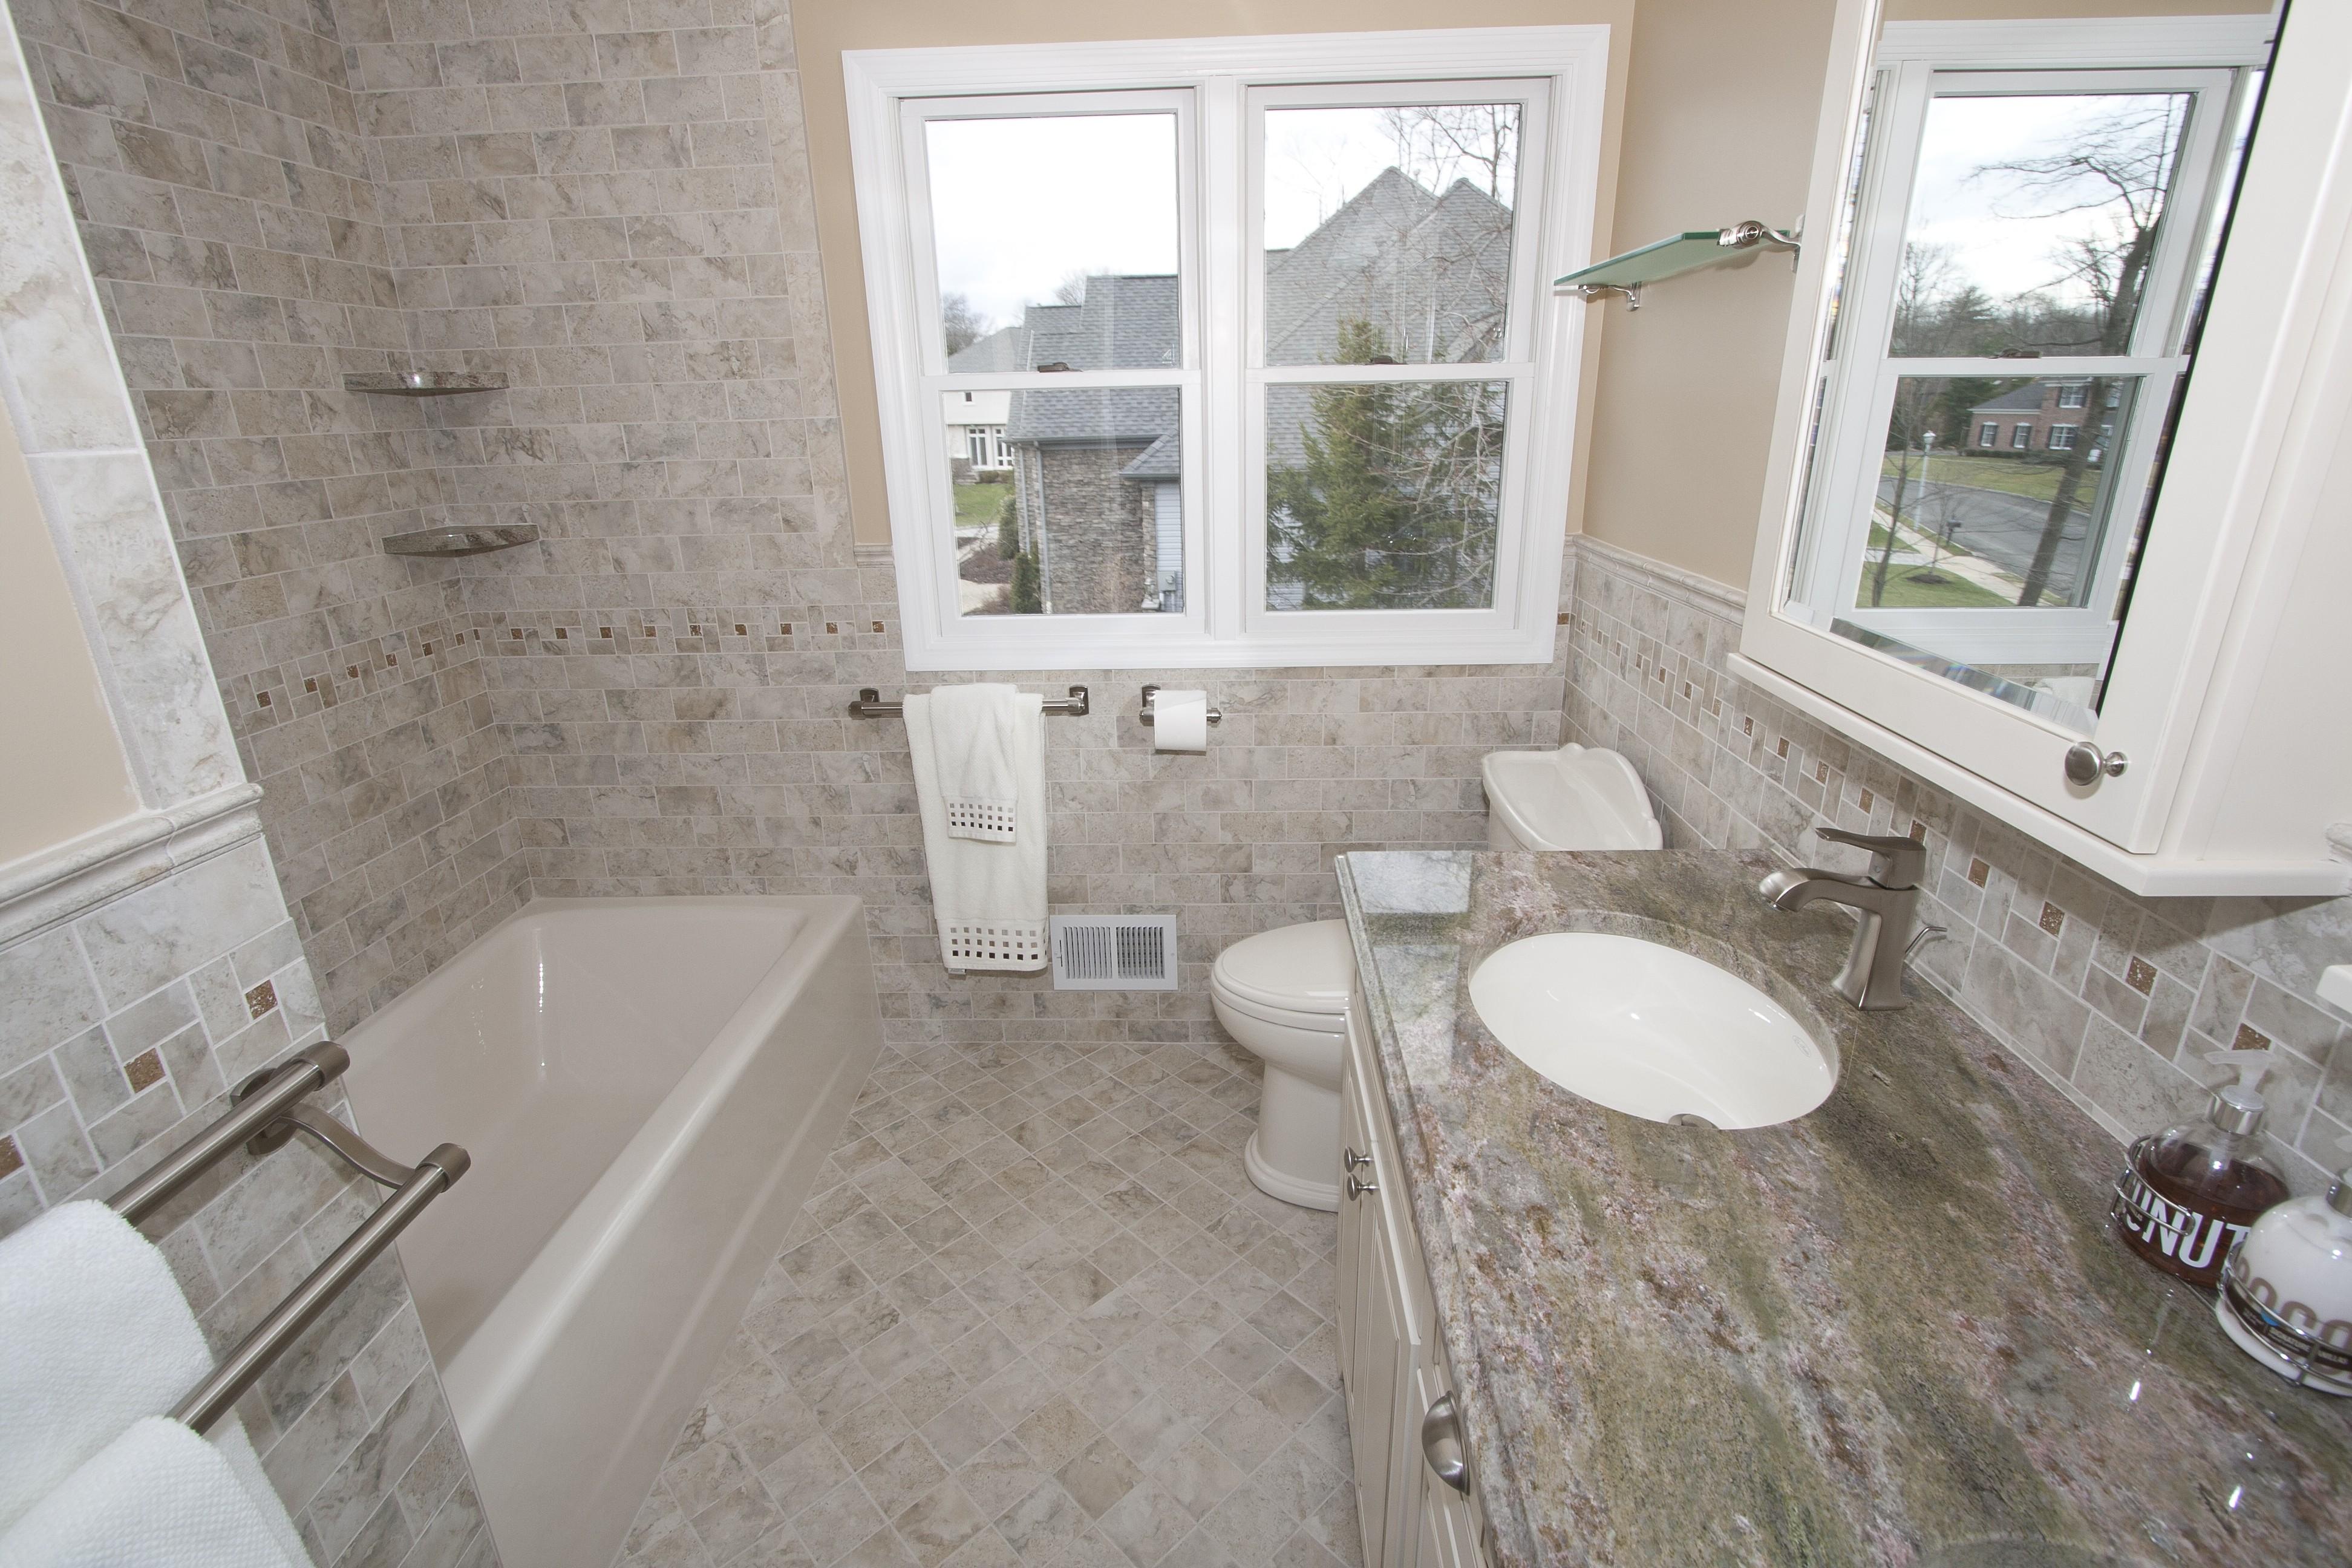 Monmouth County NJ Master Bathroom Remodel Estimates on Master Bathroom Remodel Ideas  id=54574